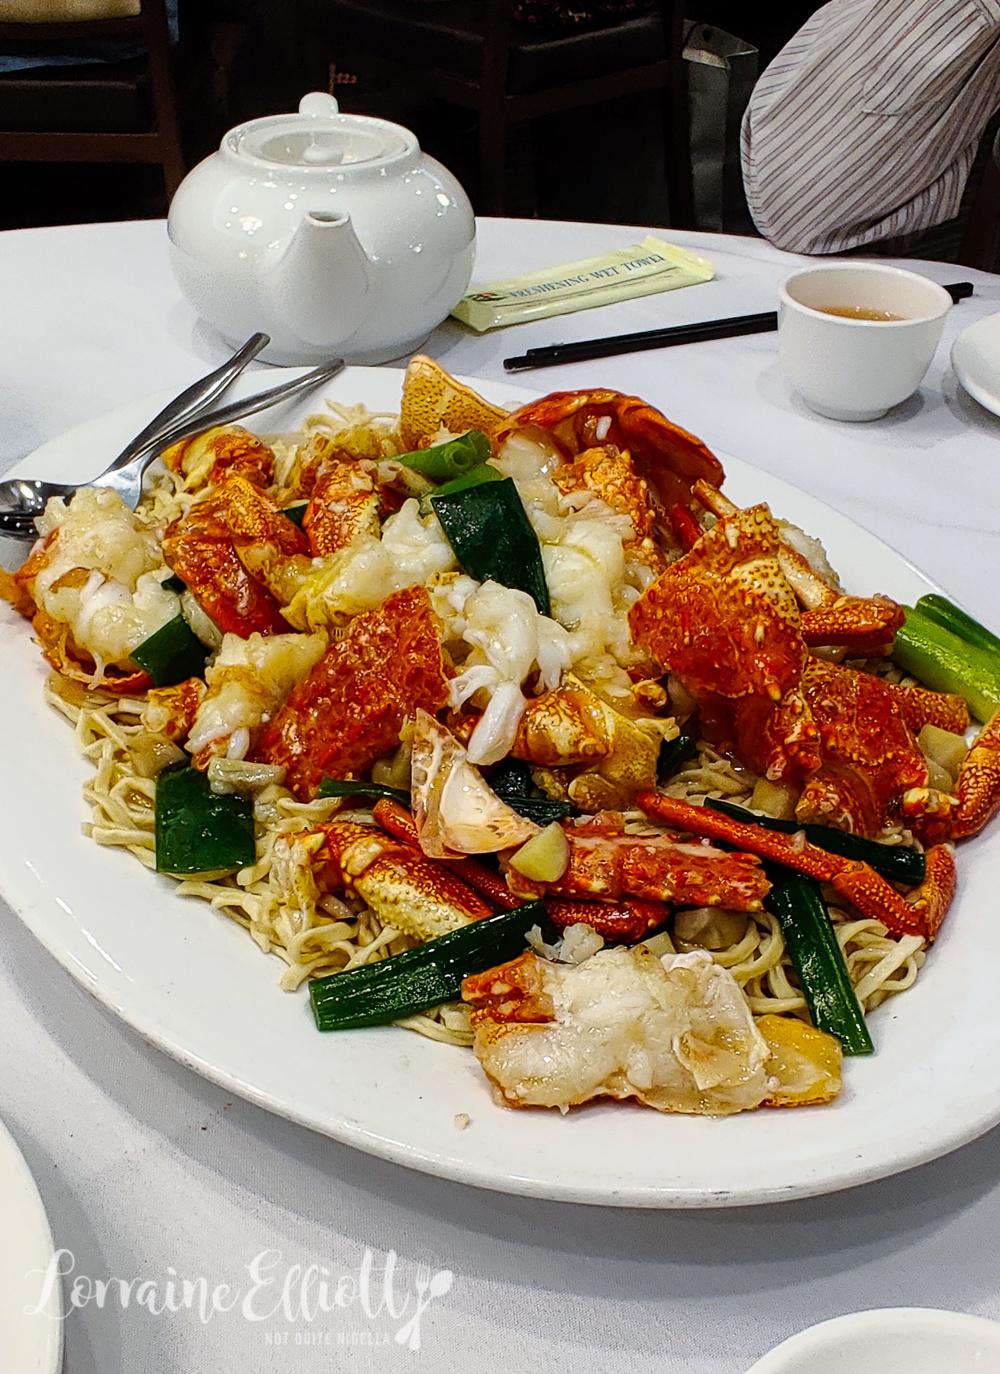 Crystal Seafood Restaurant, Strathfield